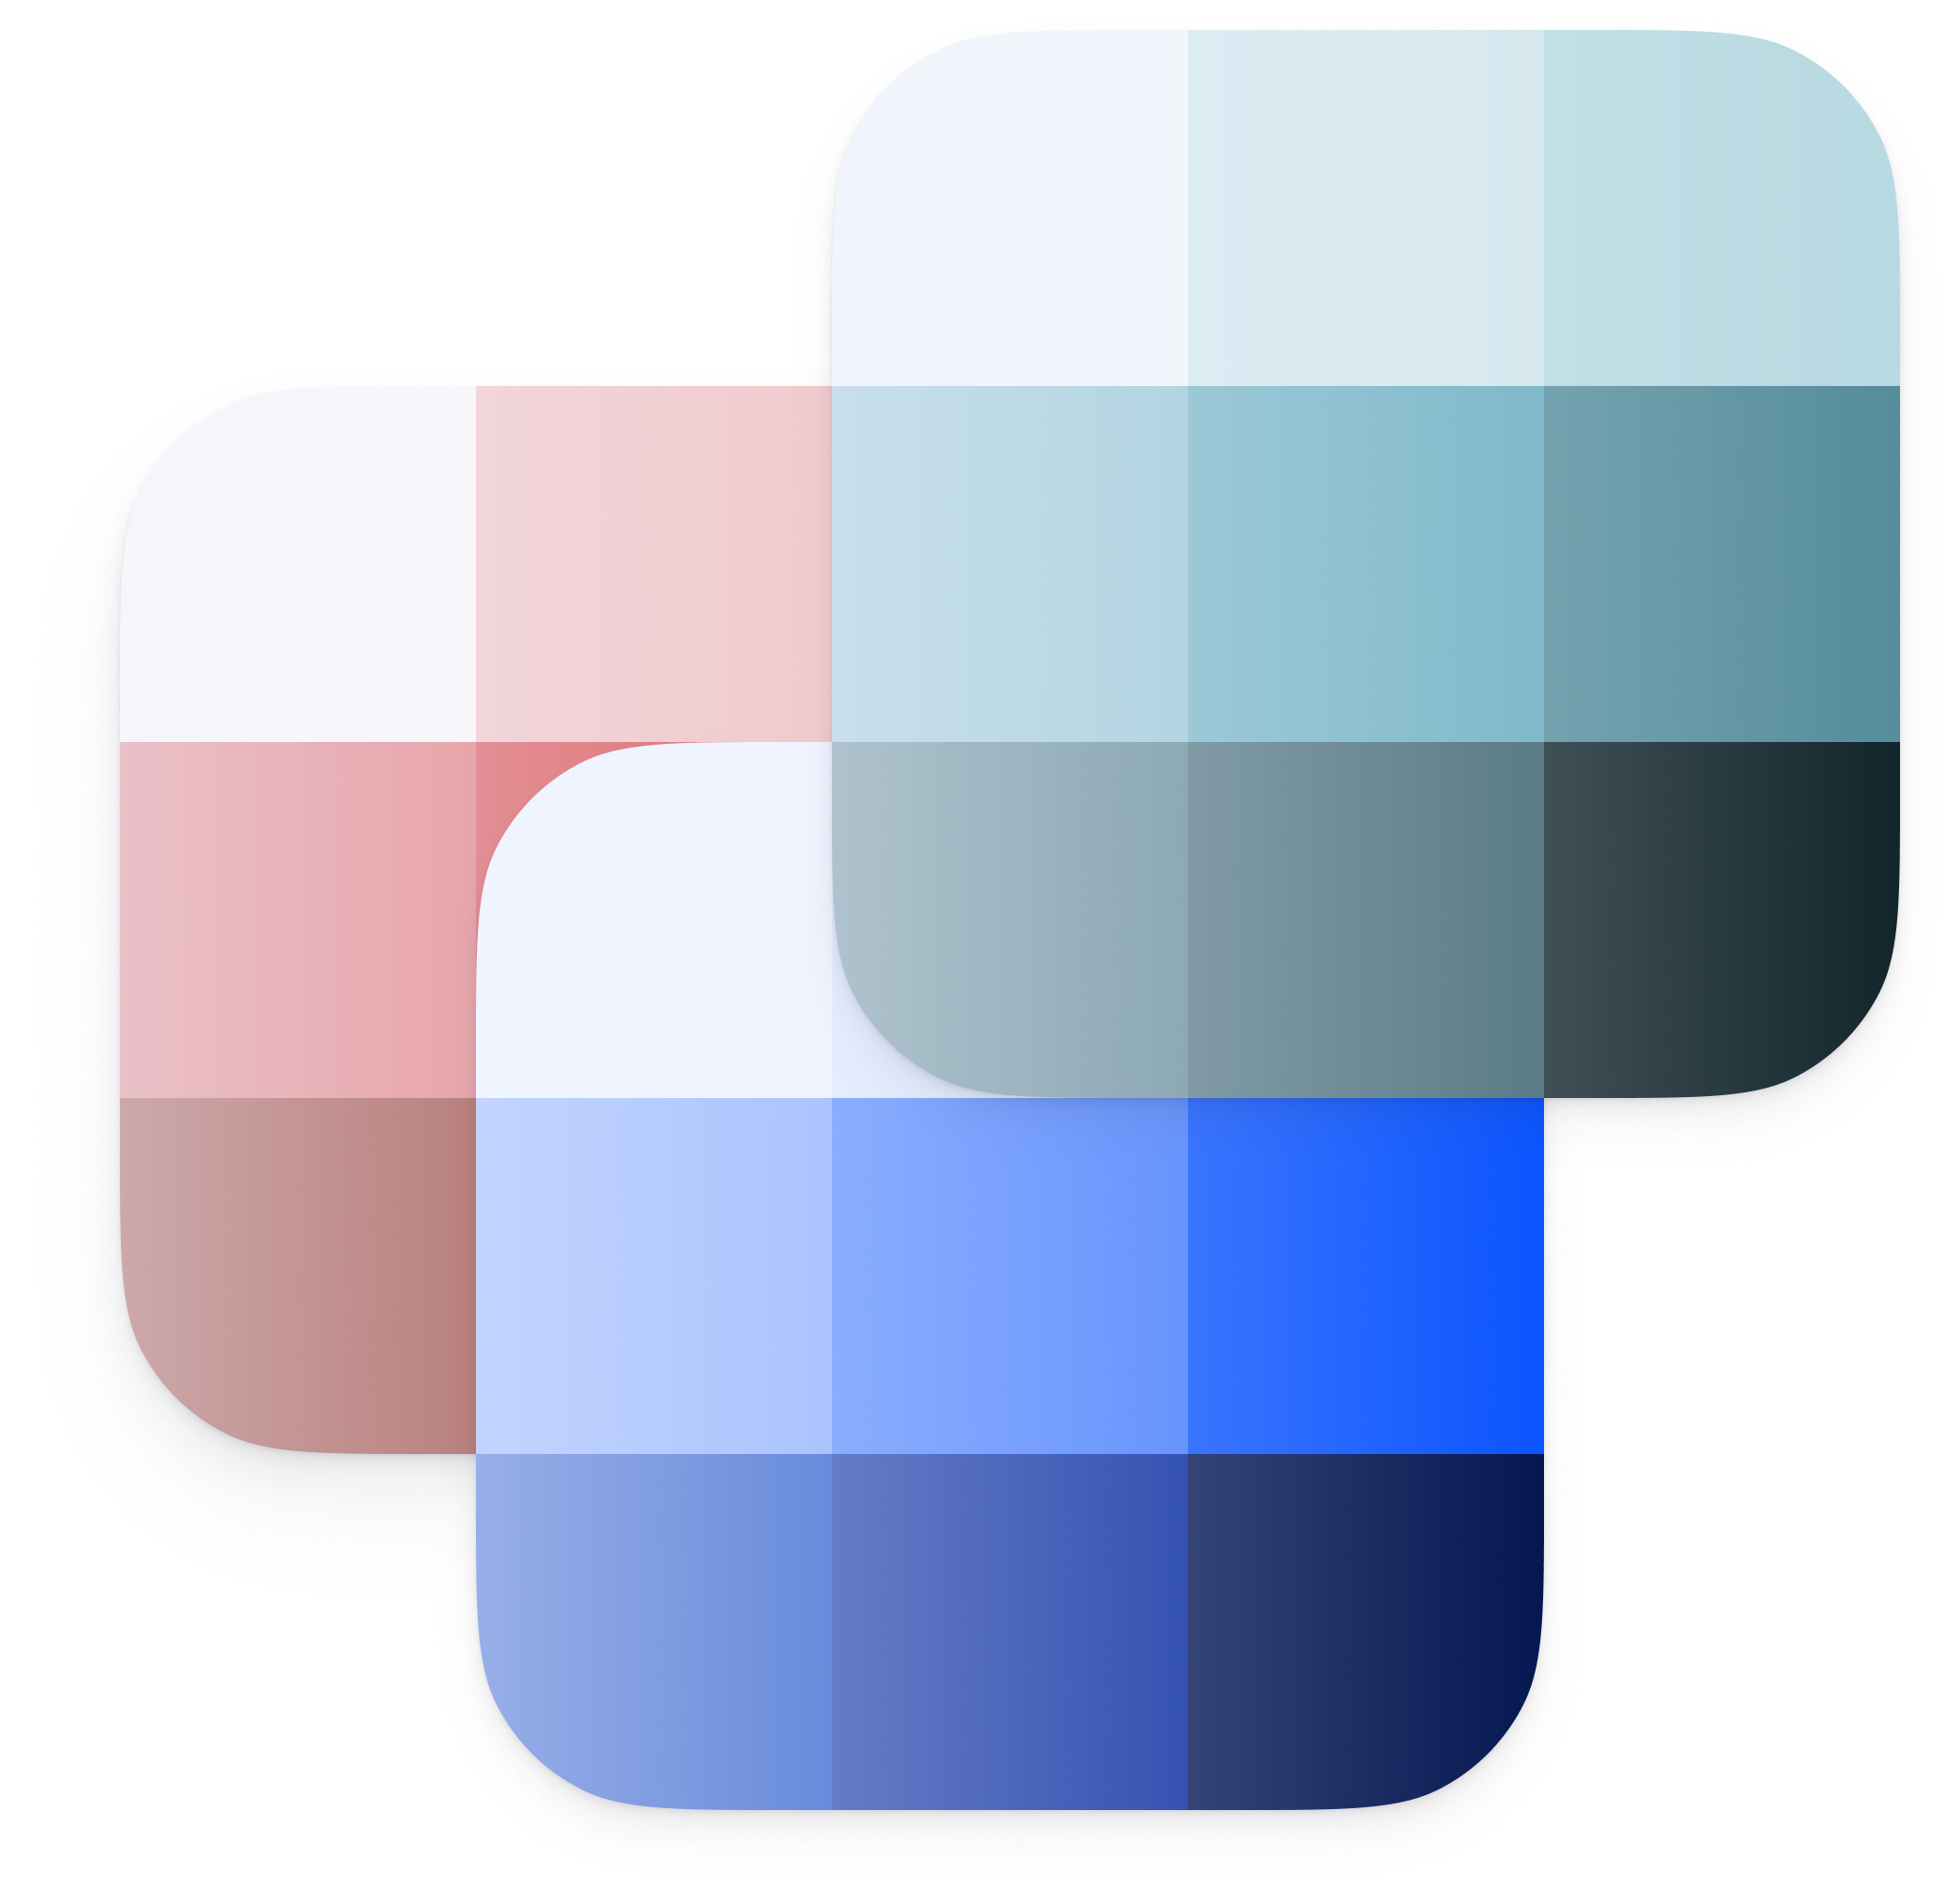 Livestorm colors image category.